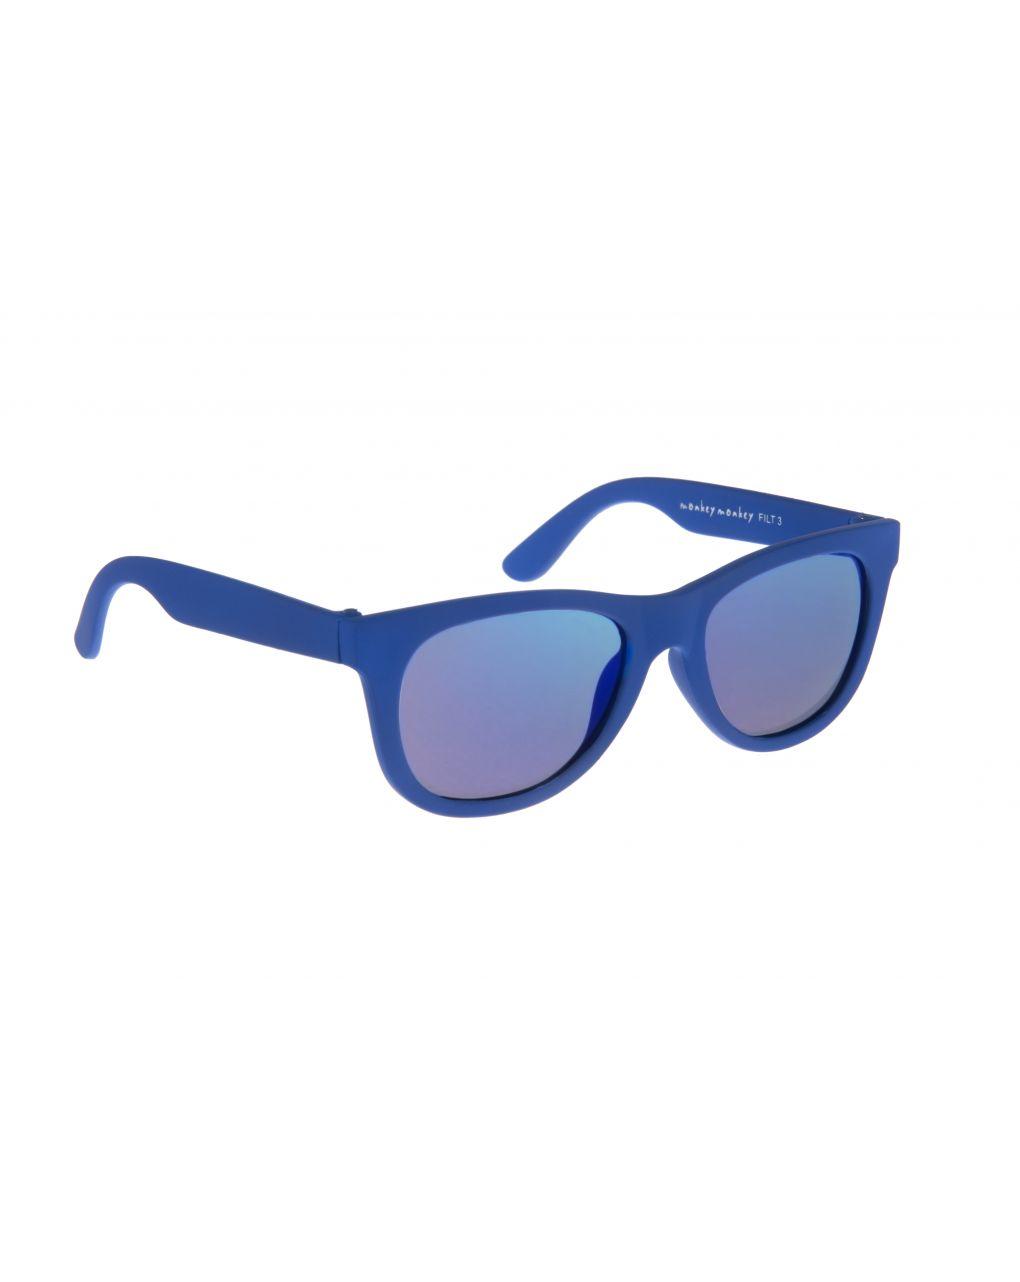 óculos de sol de borracha azul com lentes de espelho - Monkey Monkey